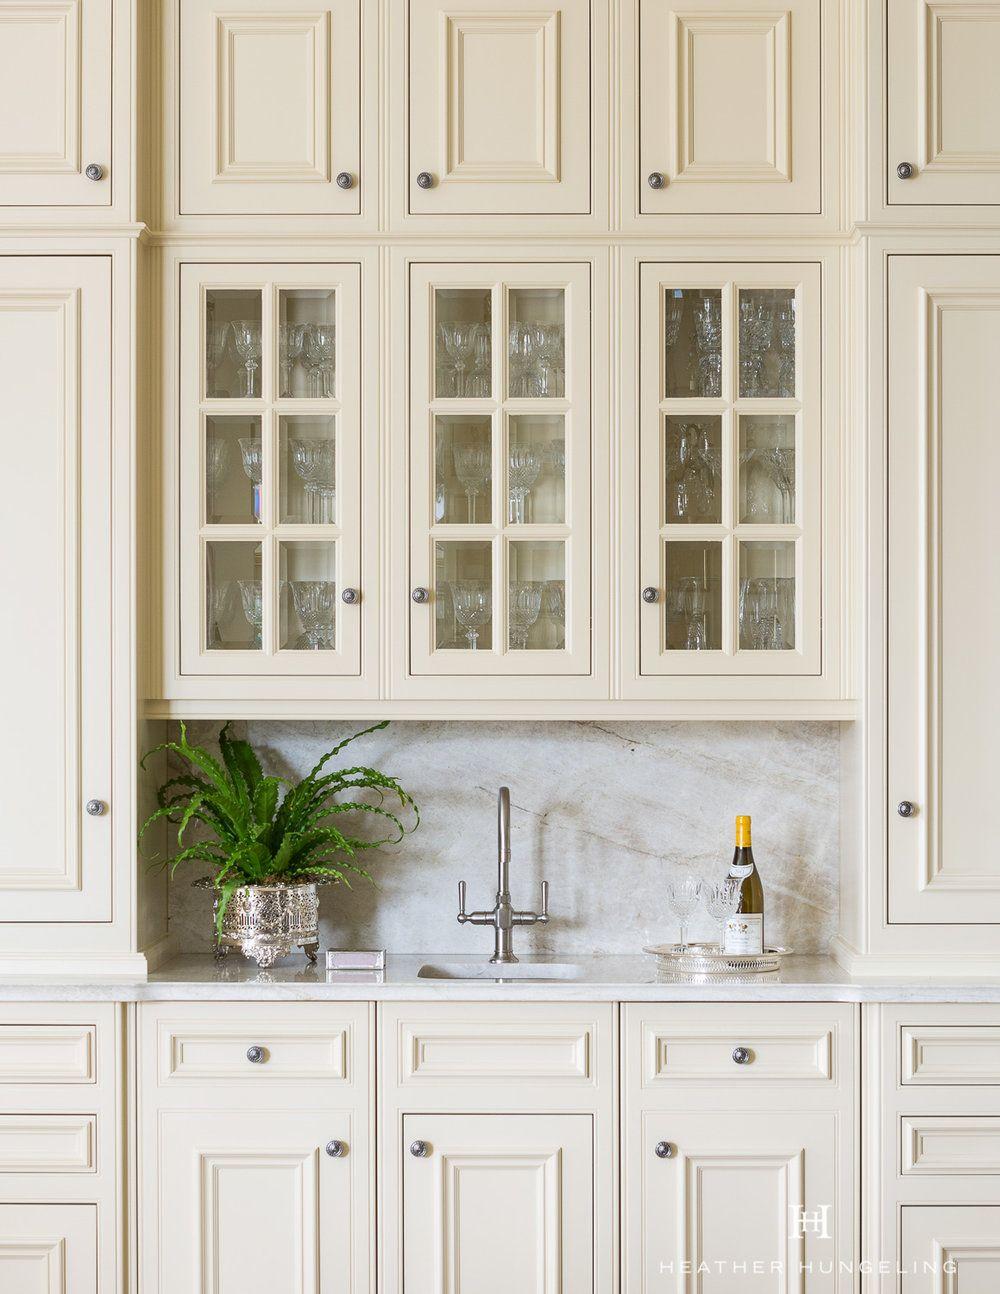 Clive Christian Architectural Kitchen In Classic Cream Dallas T Glass Cabinet Doors Kitchen Cabinetry Design Cabinetry Design